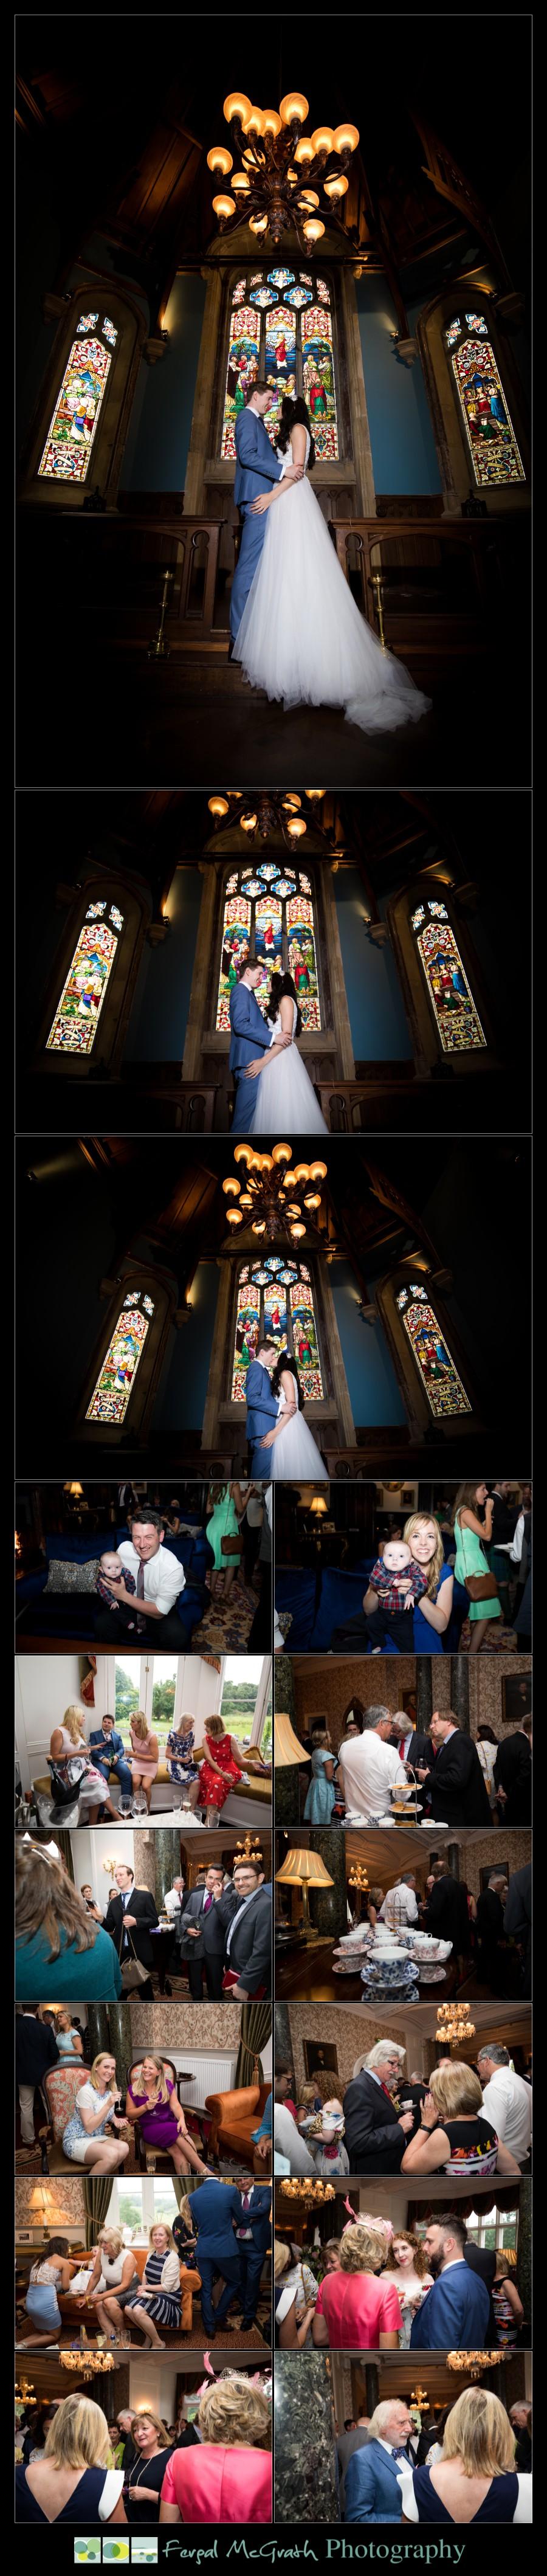 Markree Castle Wedding photos on the amazing staircase